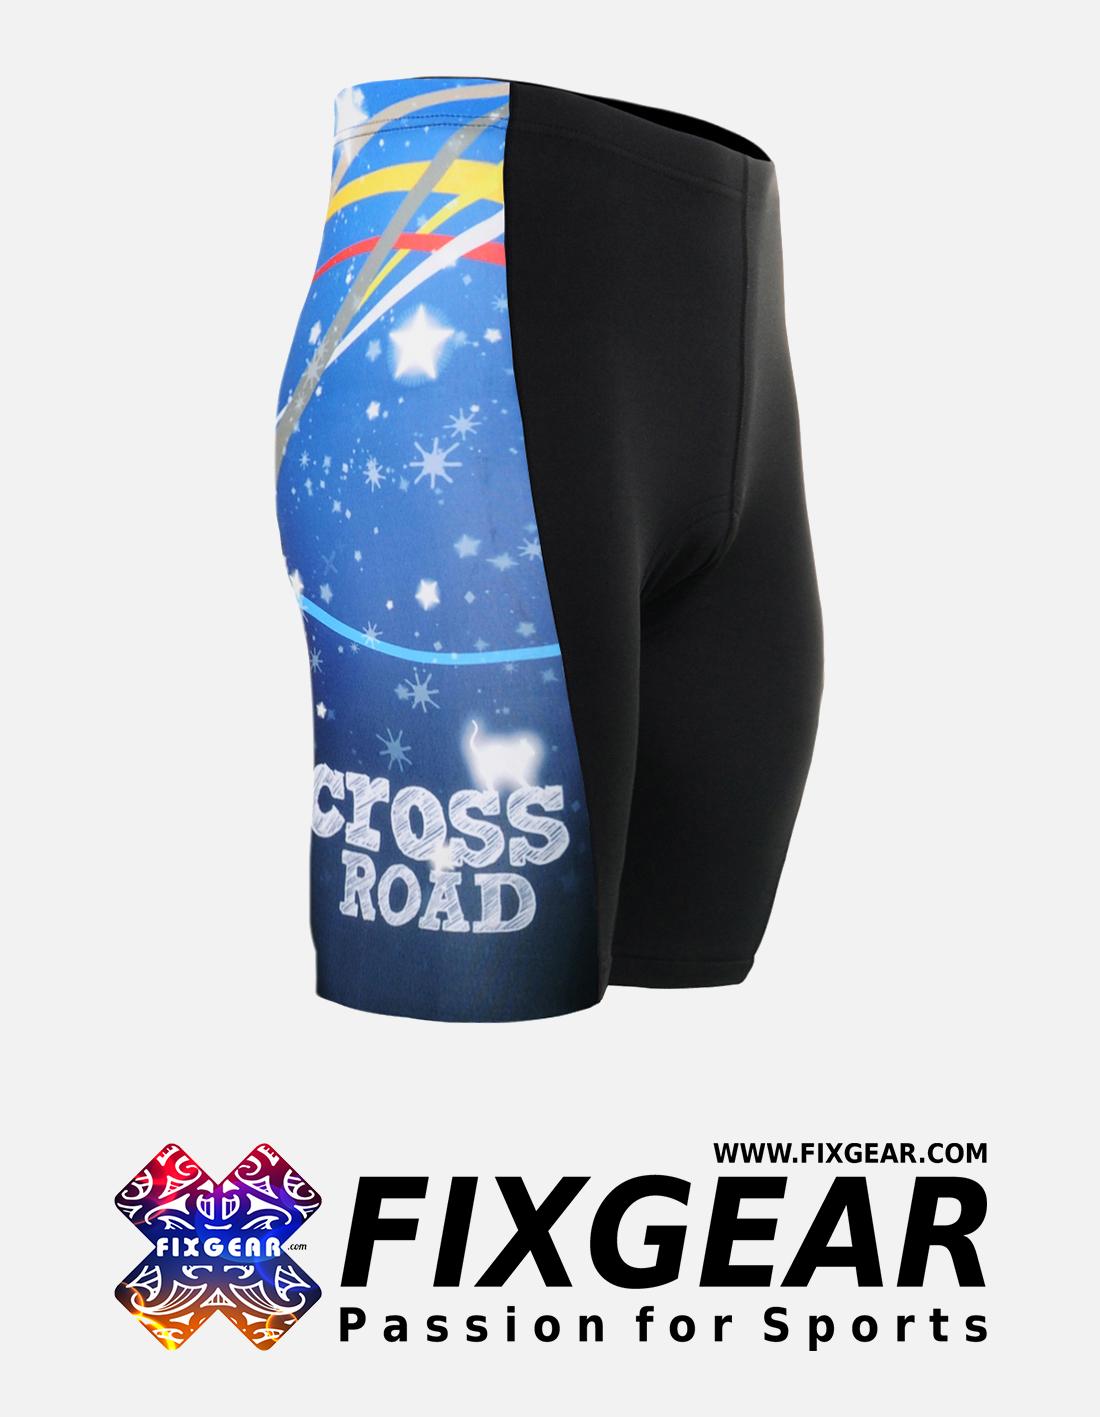 FIXGEAR ST-W23 Women's Cycling Padded Shorts